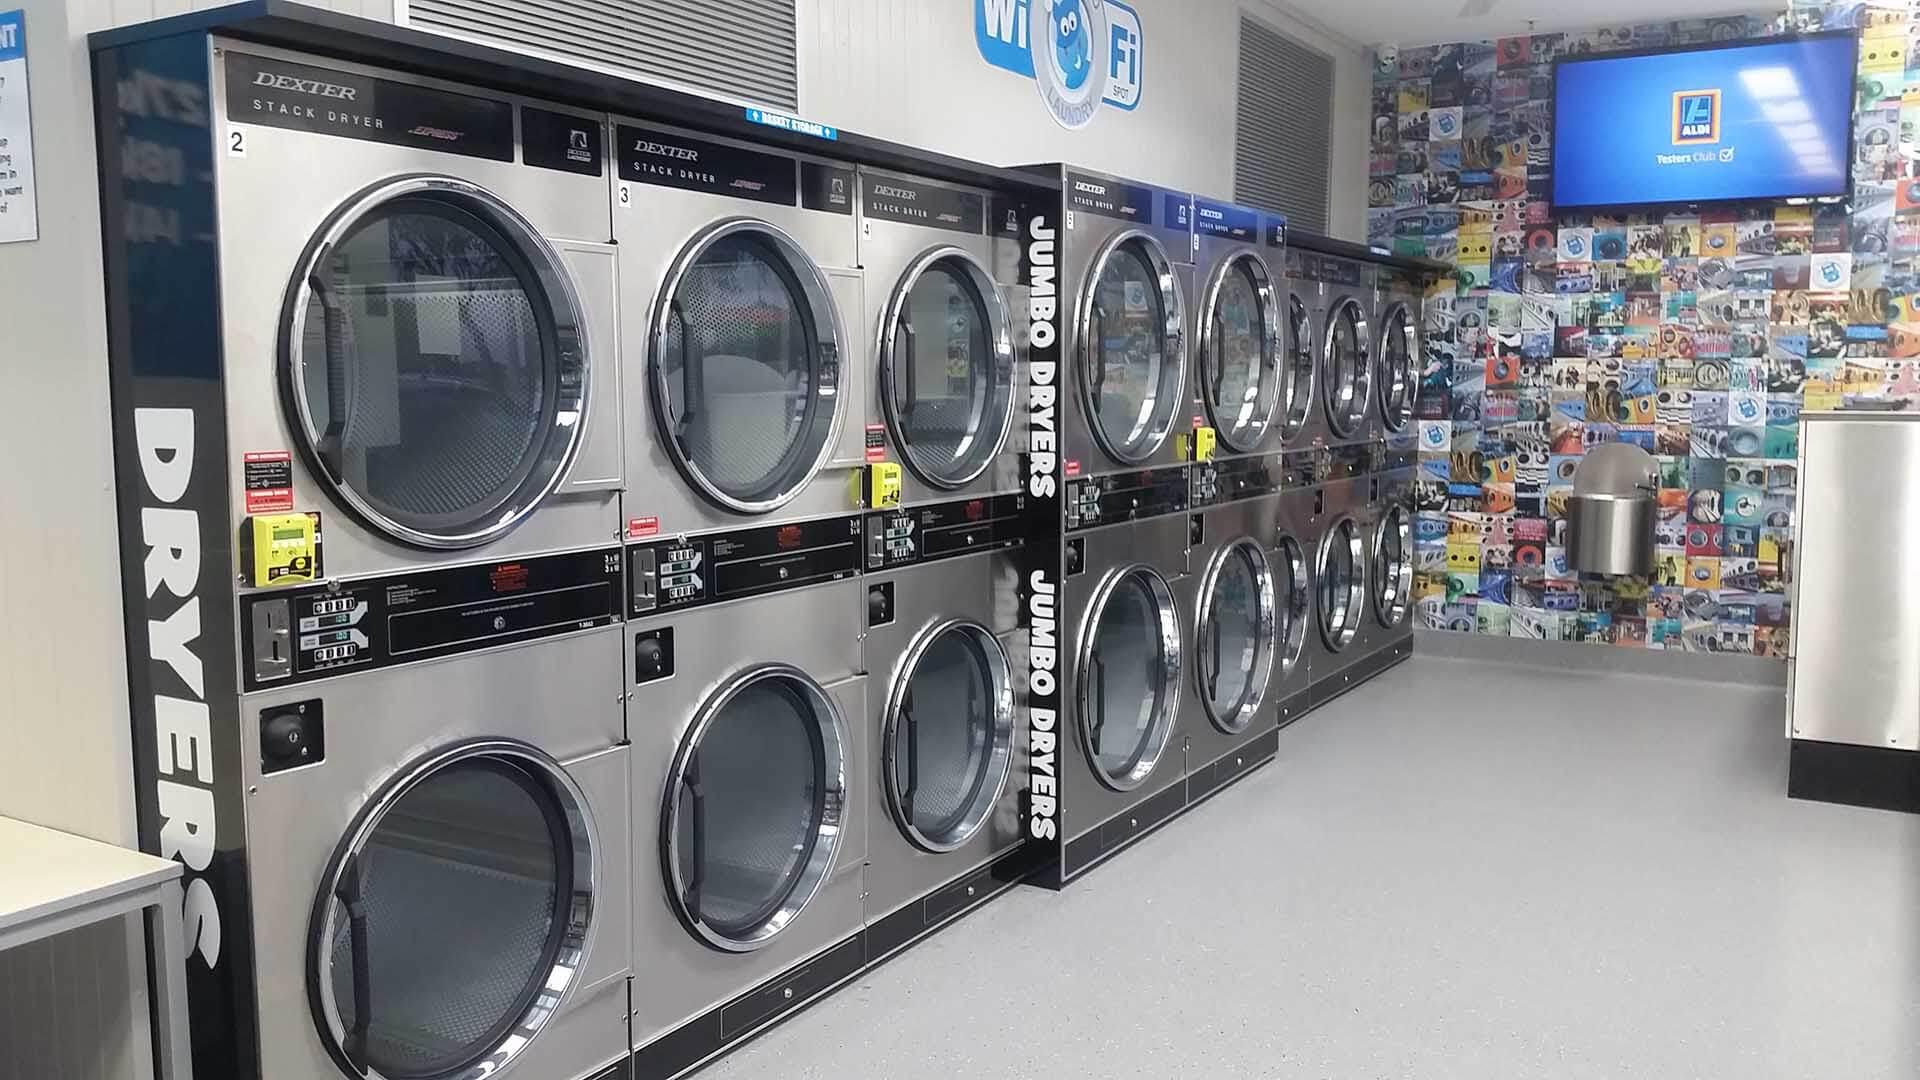 Melbourne Coin Laundry laundromats